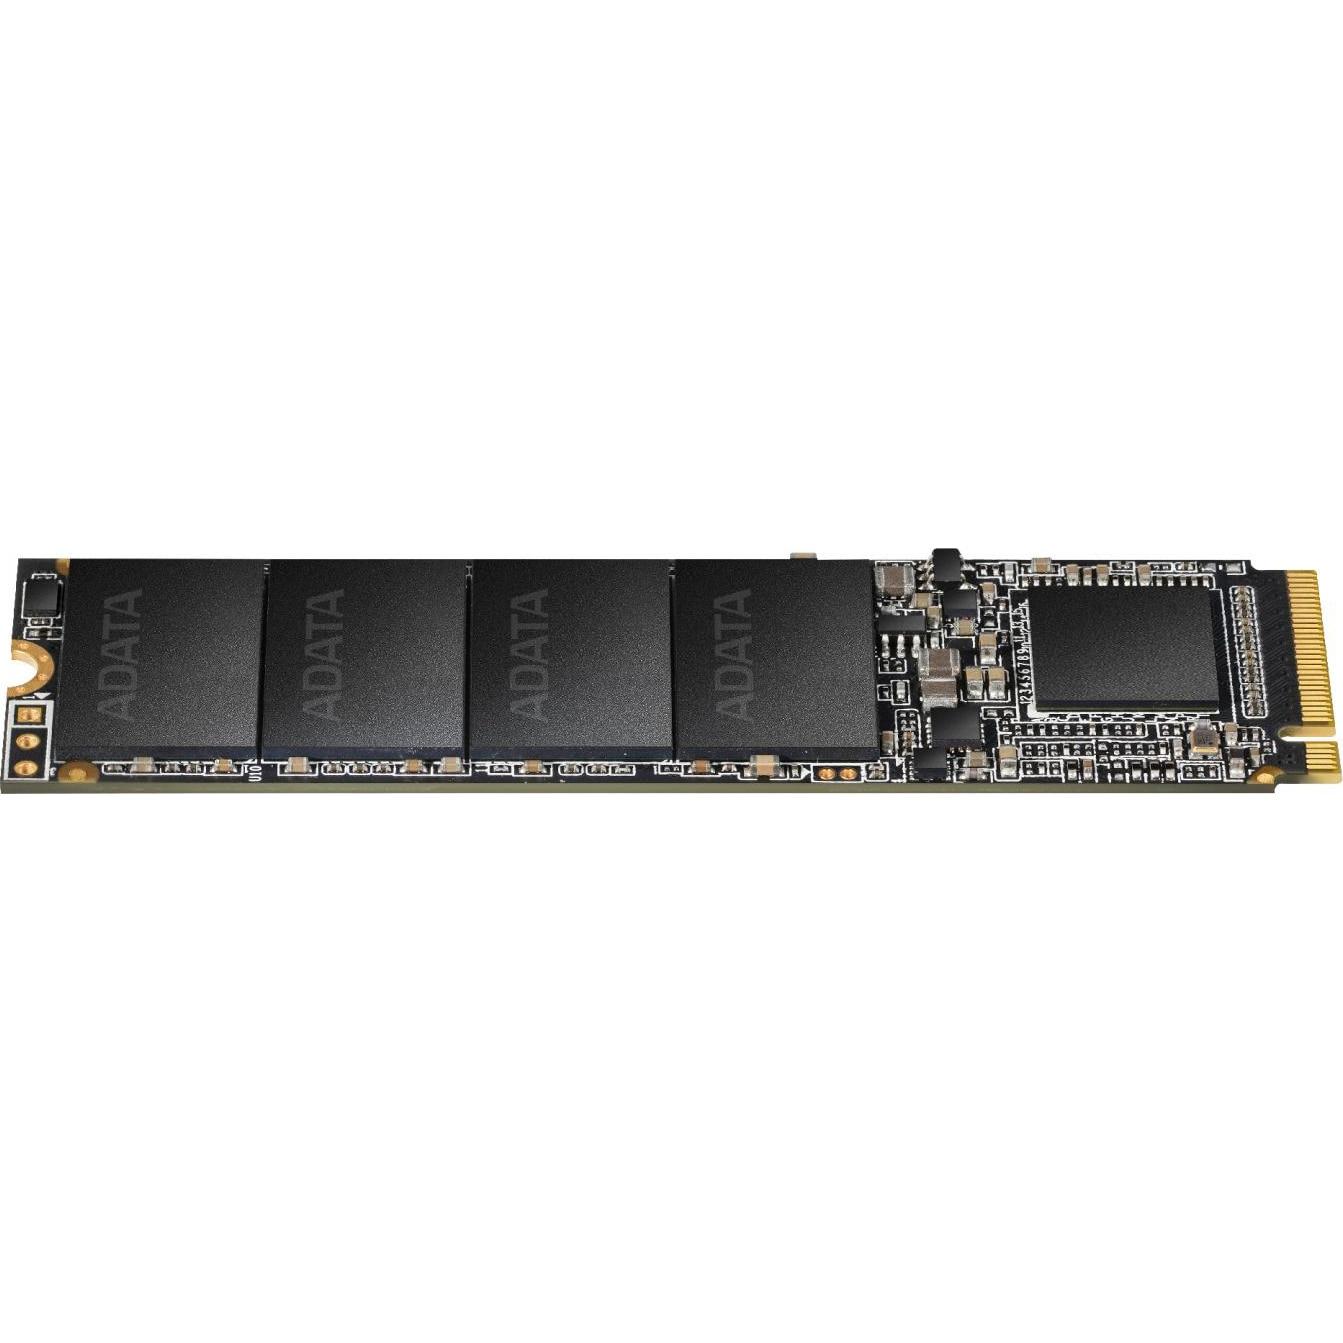 Fotografie Solid-state Drive (SSD) XPG SX6000 Lite, 512GB, NVMe, M.2.